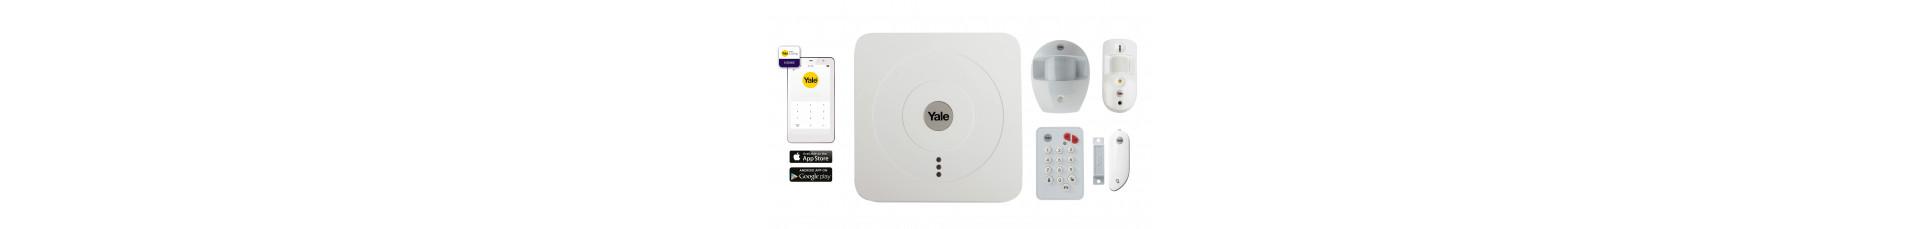 Yale Smart Alarmsystemen kopen?